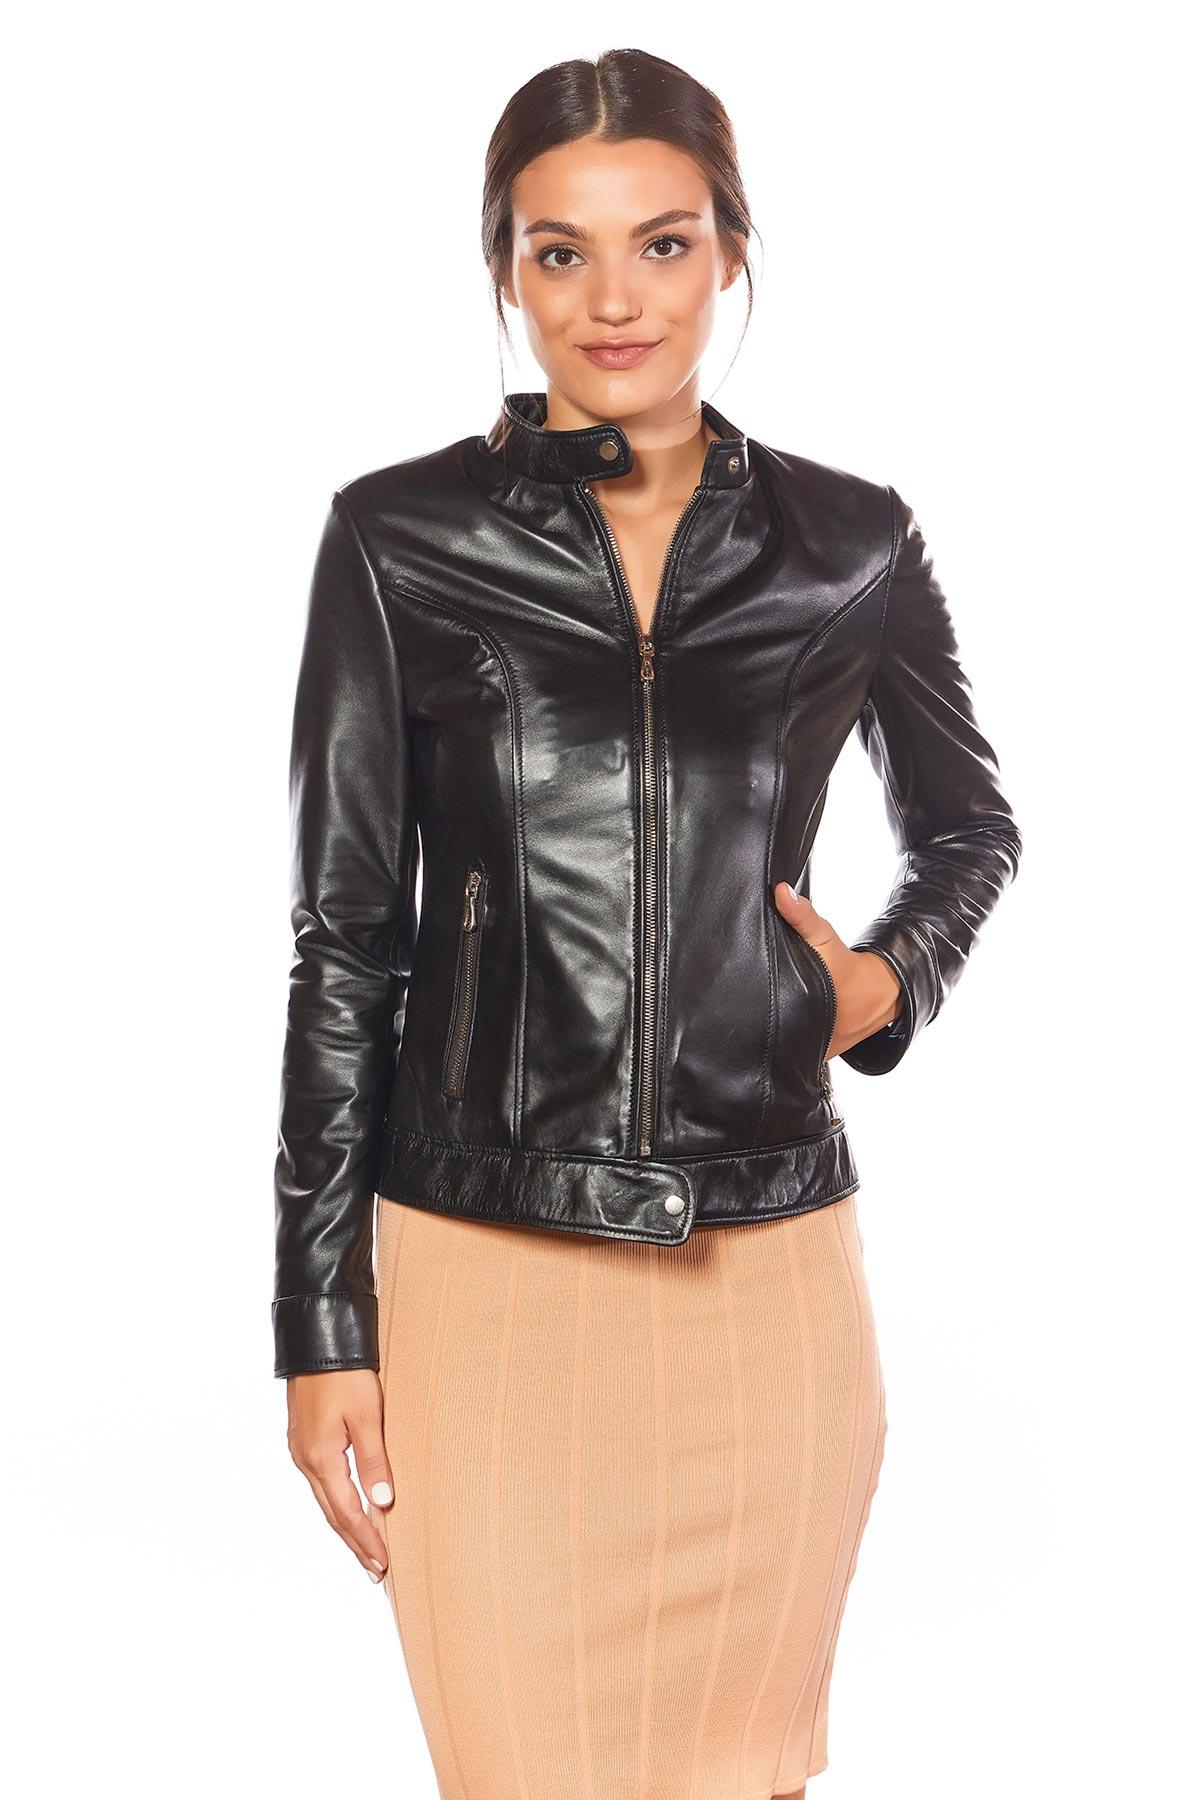 women's plus size leather jacket